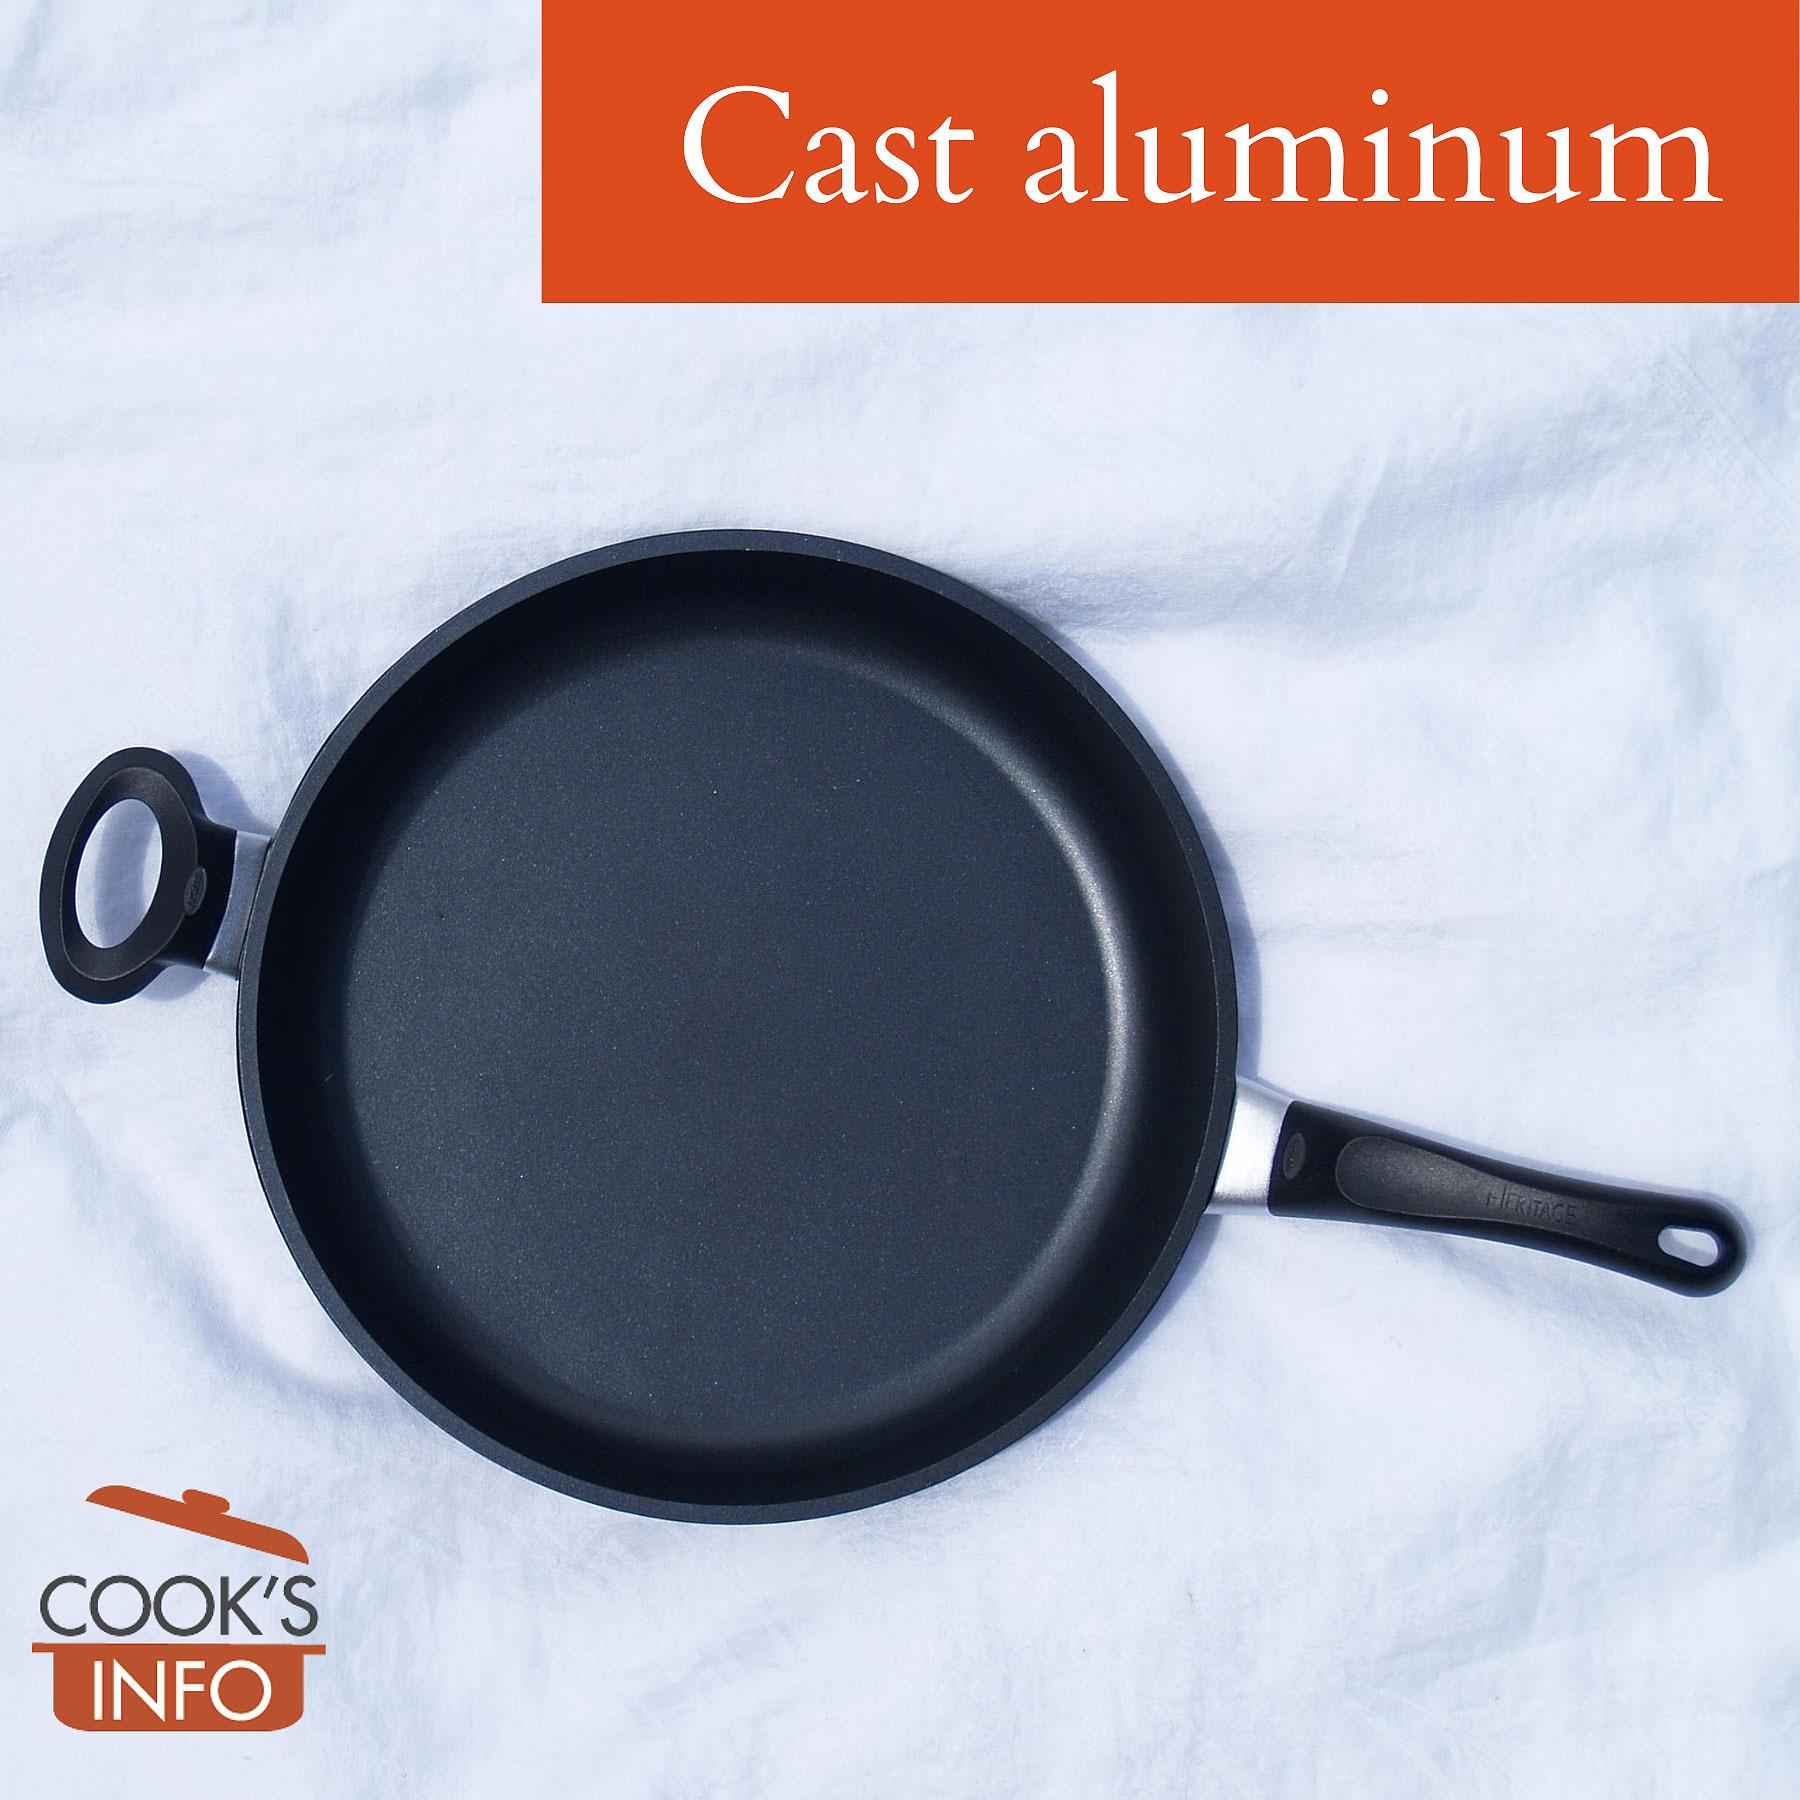 Cast aluminum pan